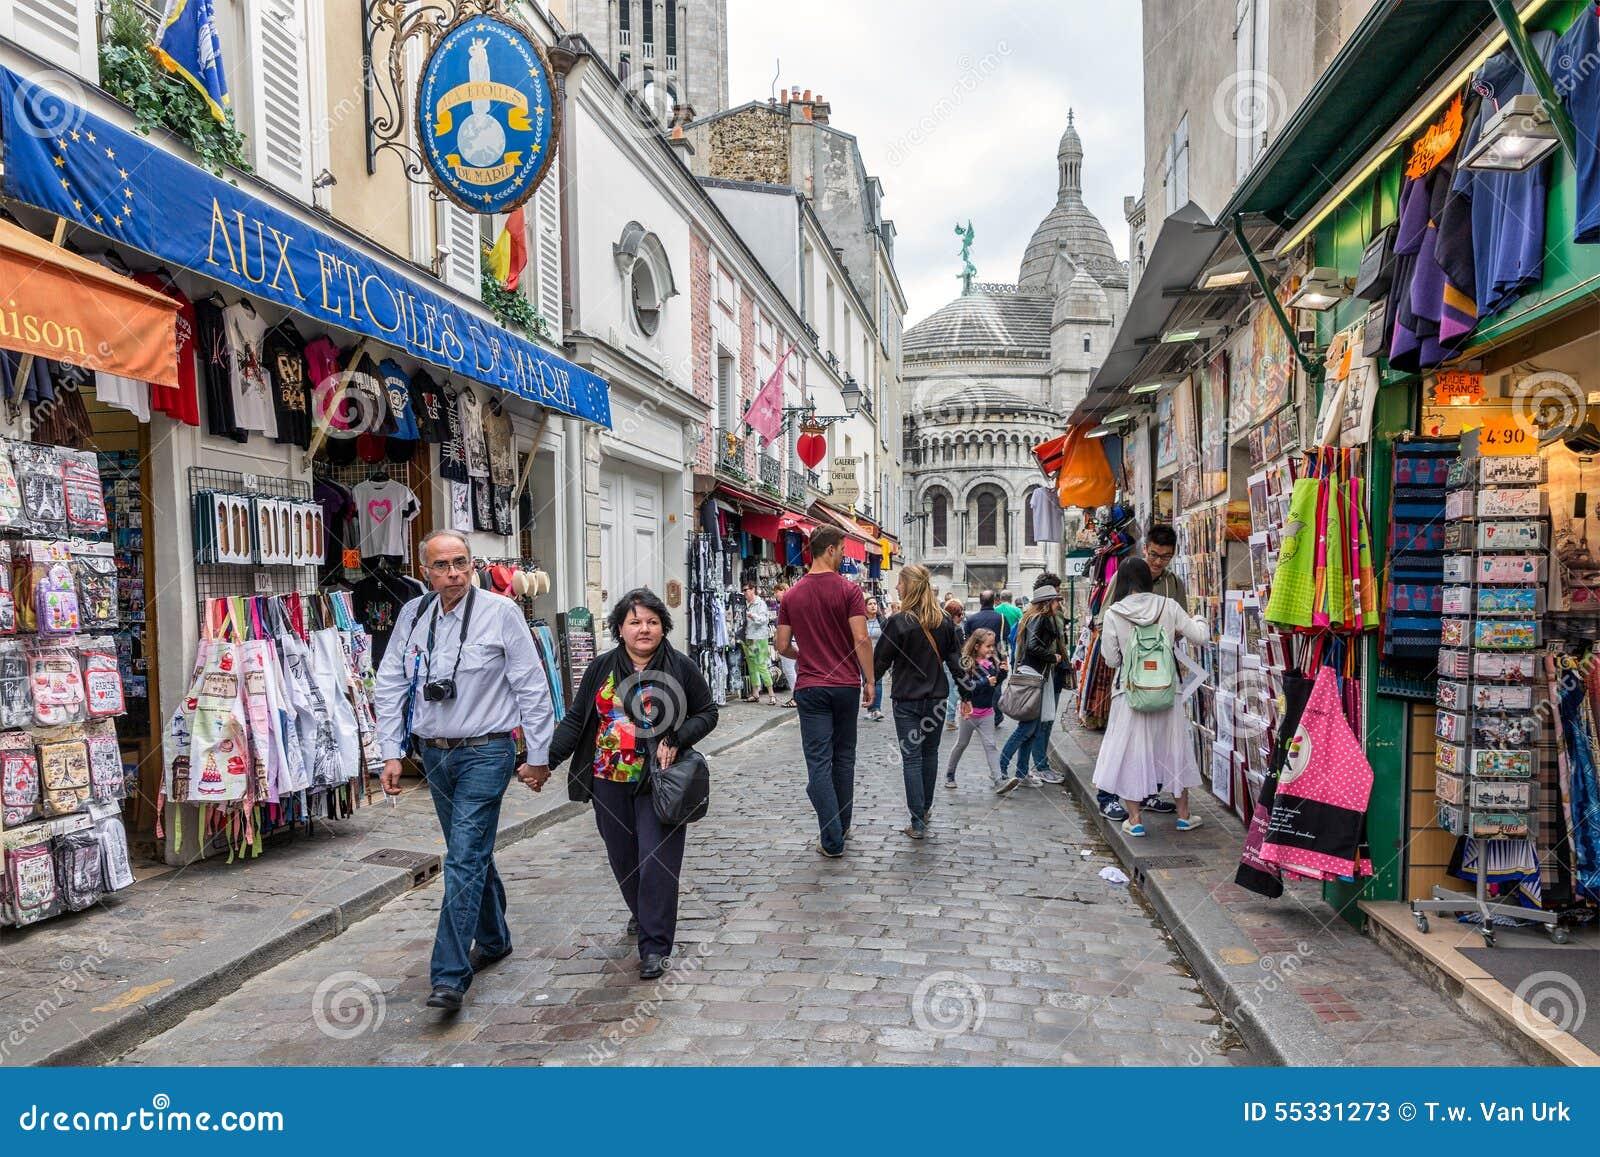 Tourists walking near the gift shops of montmartre paris france download comp negle Images